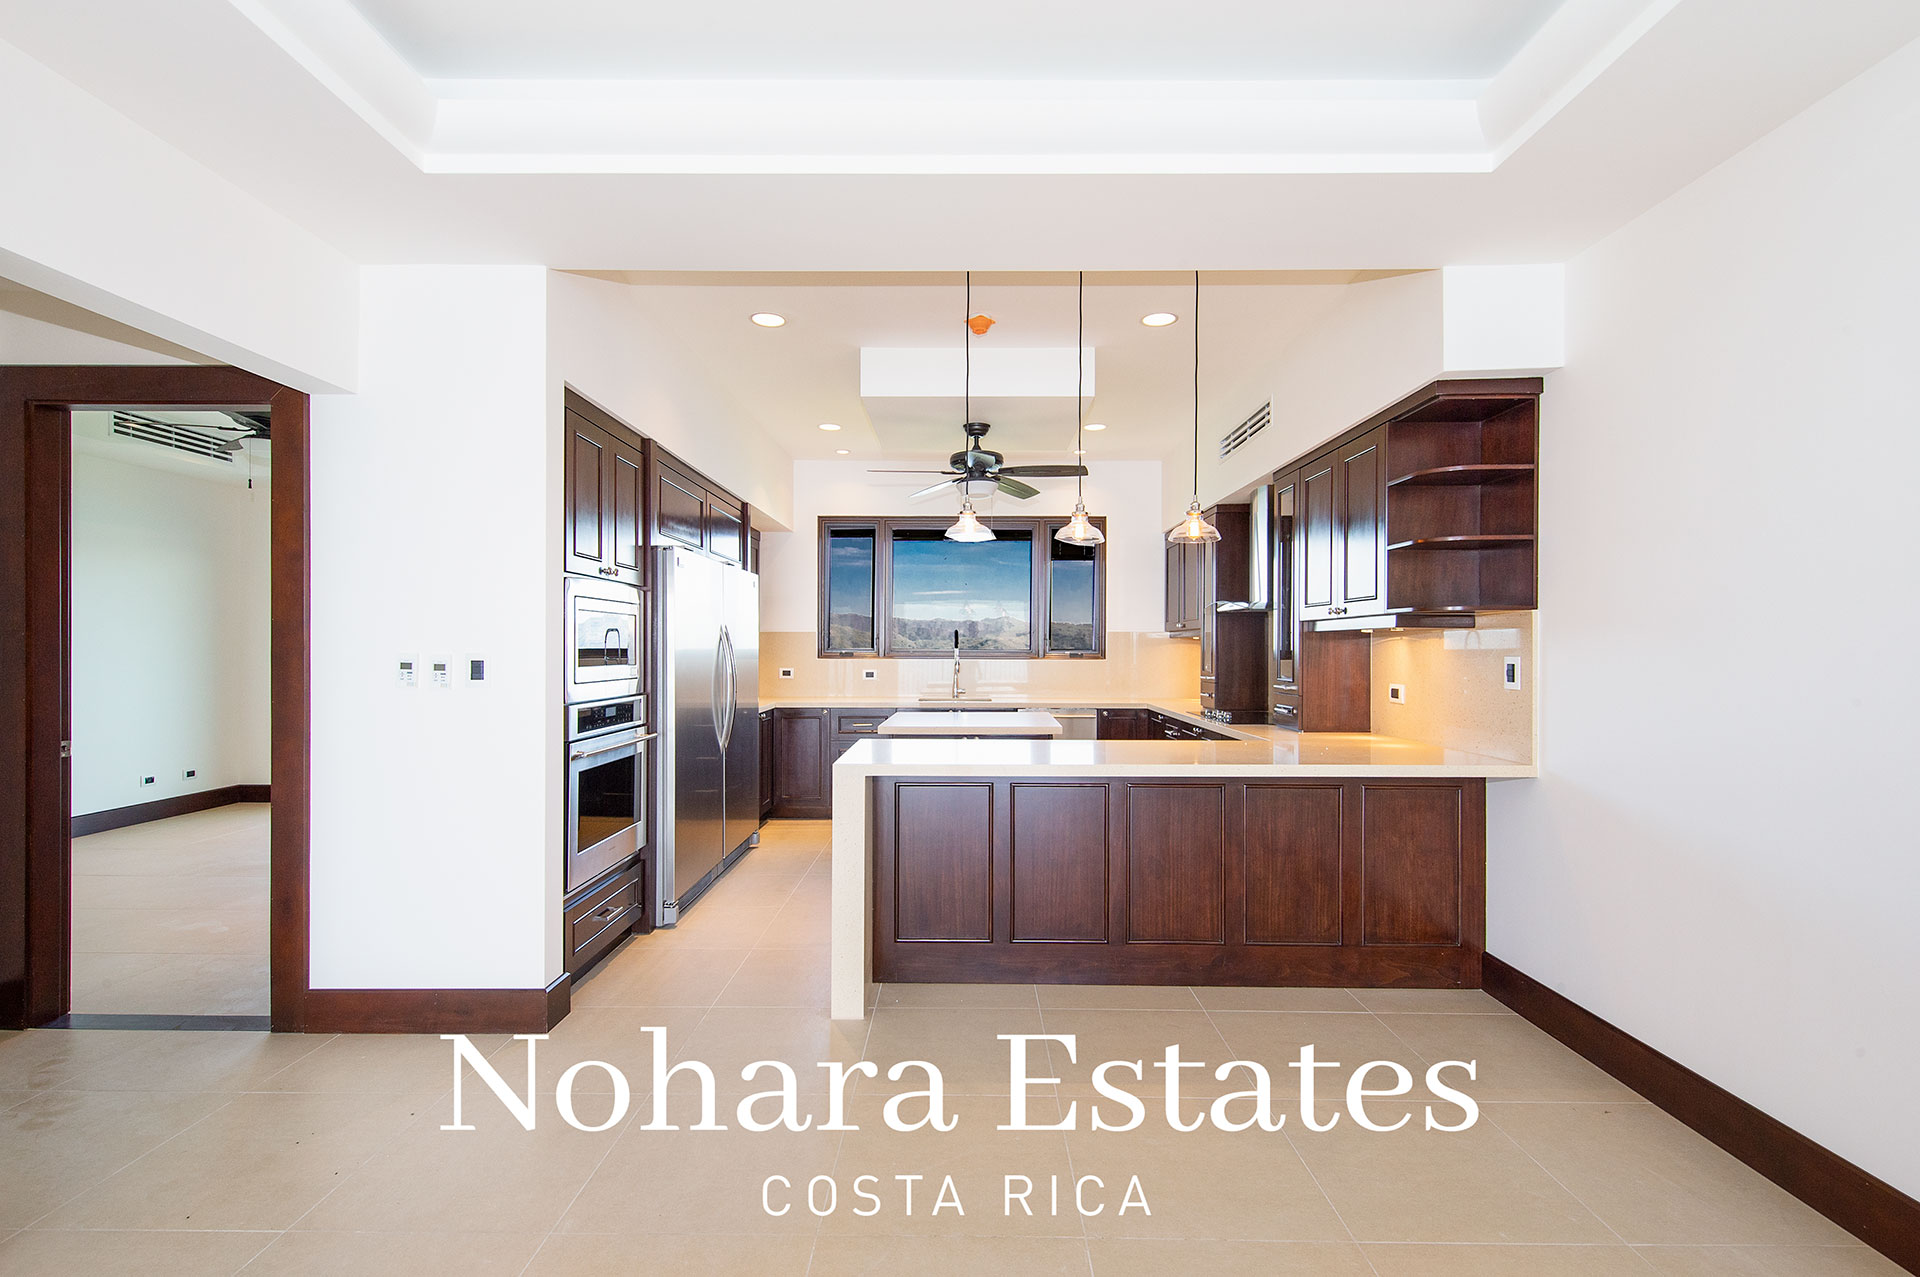 Nohara Estates Costa Rica 360 Esplendor Pacifico Playa Flamingo Penthouse 8